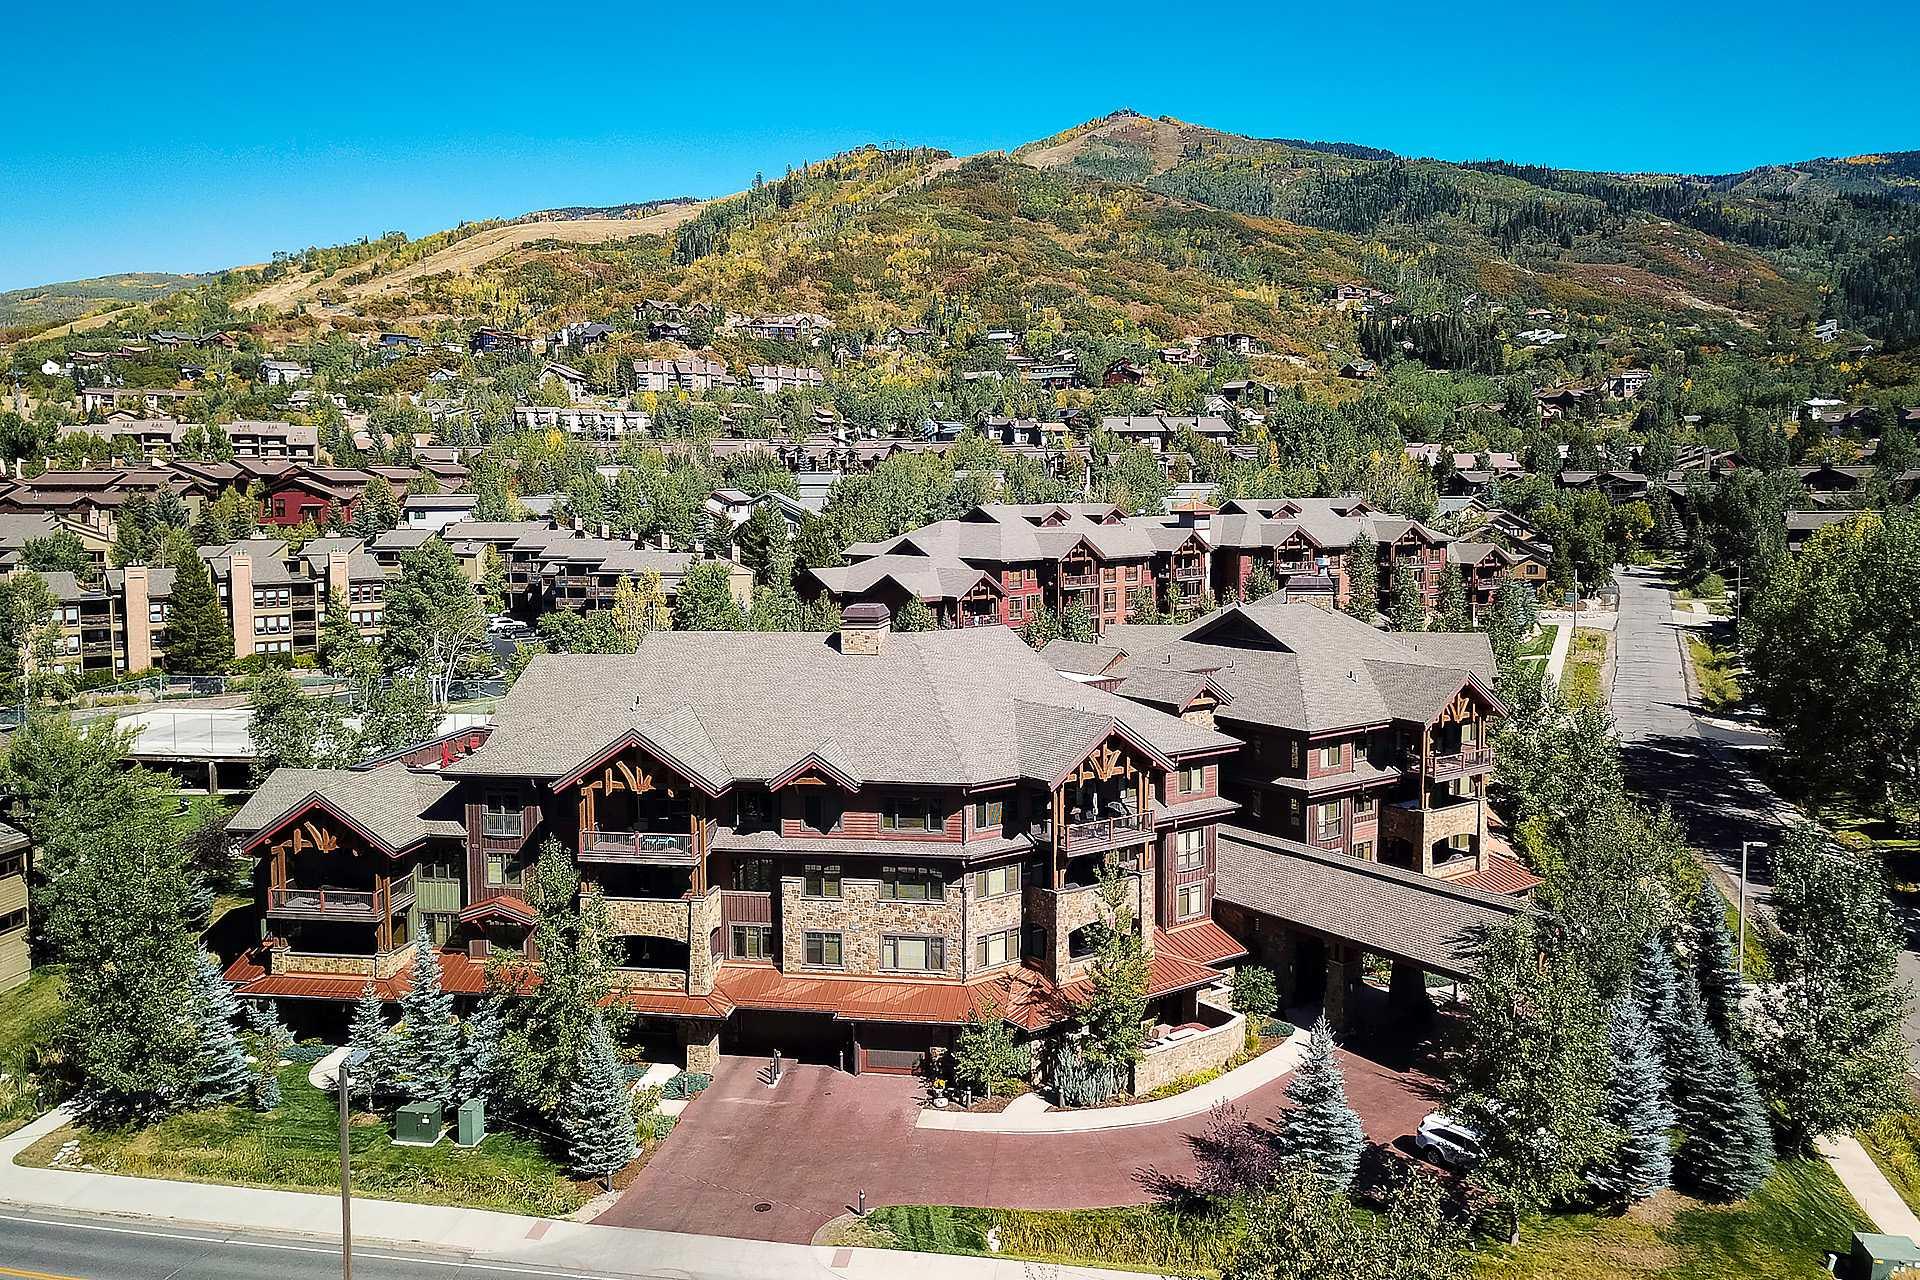 BL6205: Bear Lodge